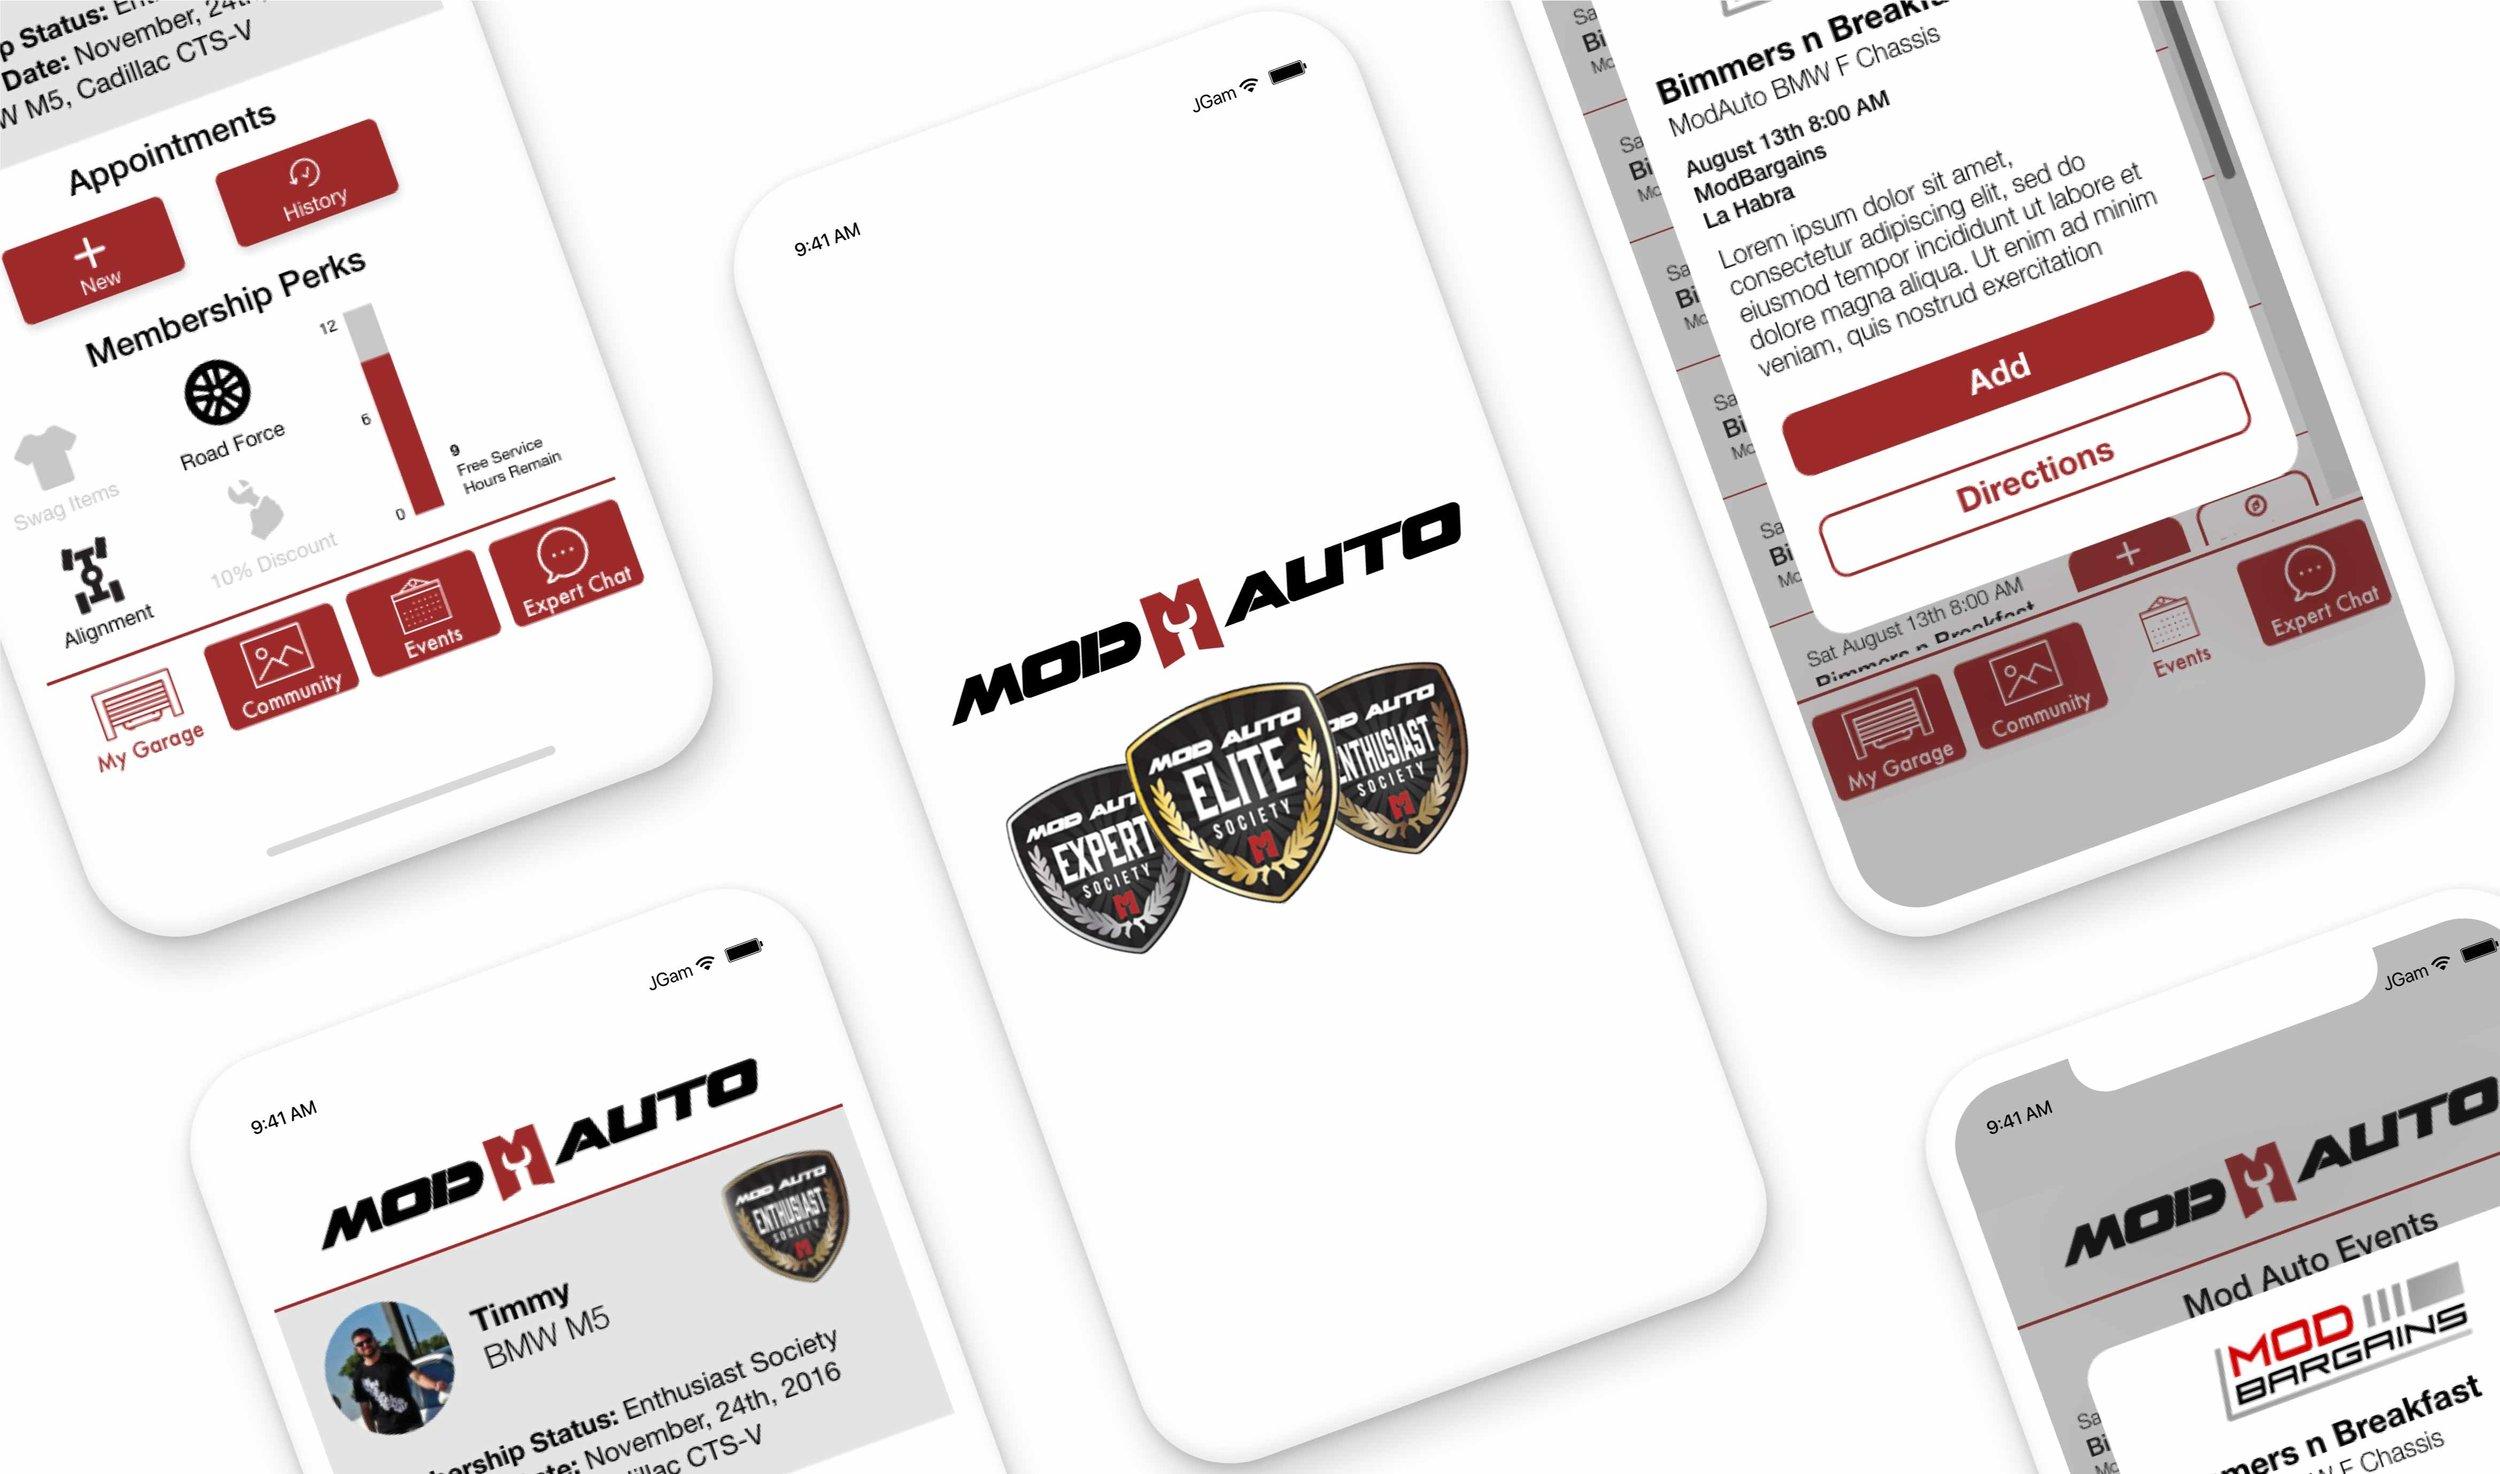 ModAuto-Thumbnail-Hero-TileV4.jpg